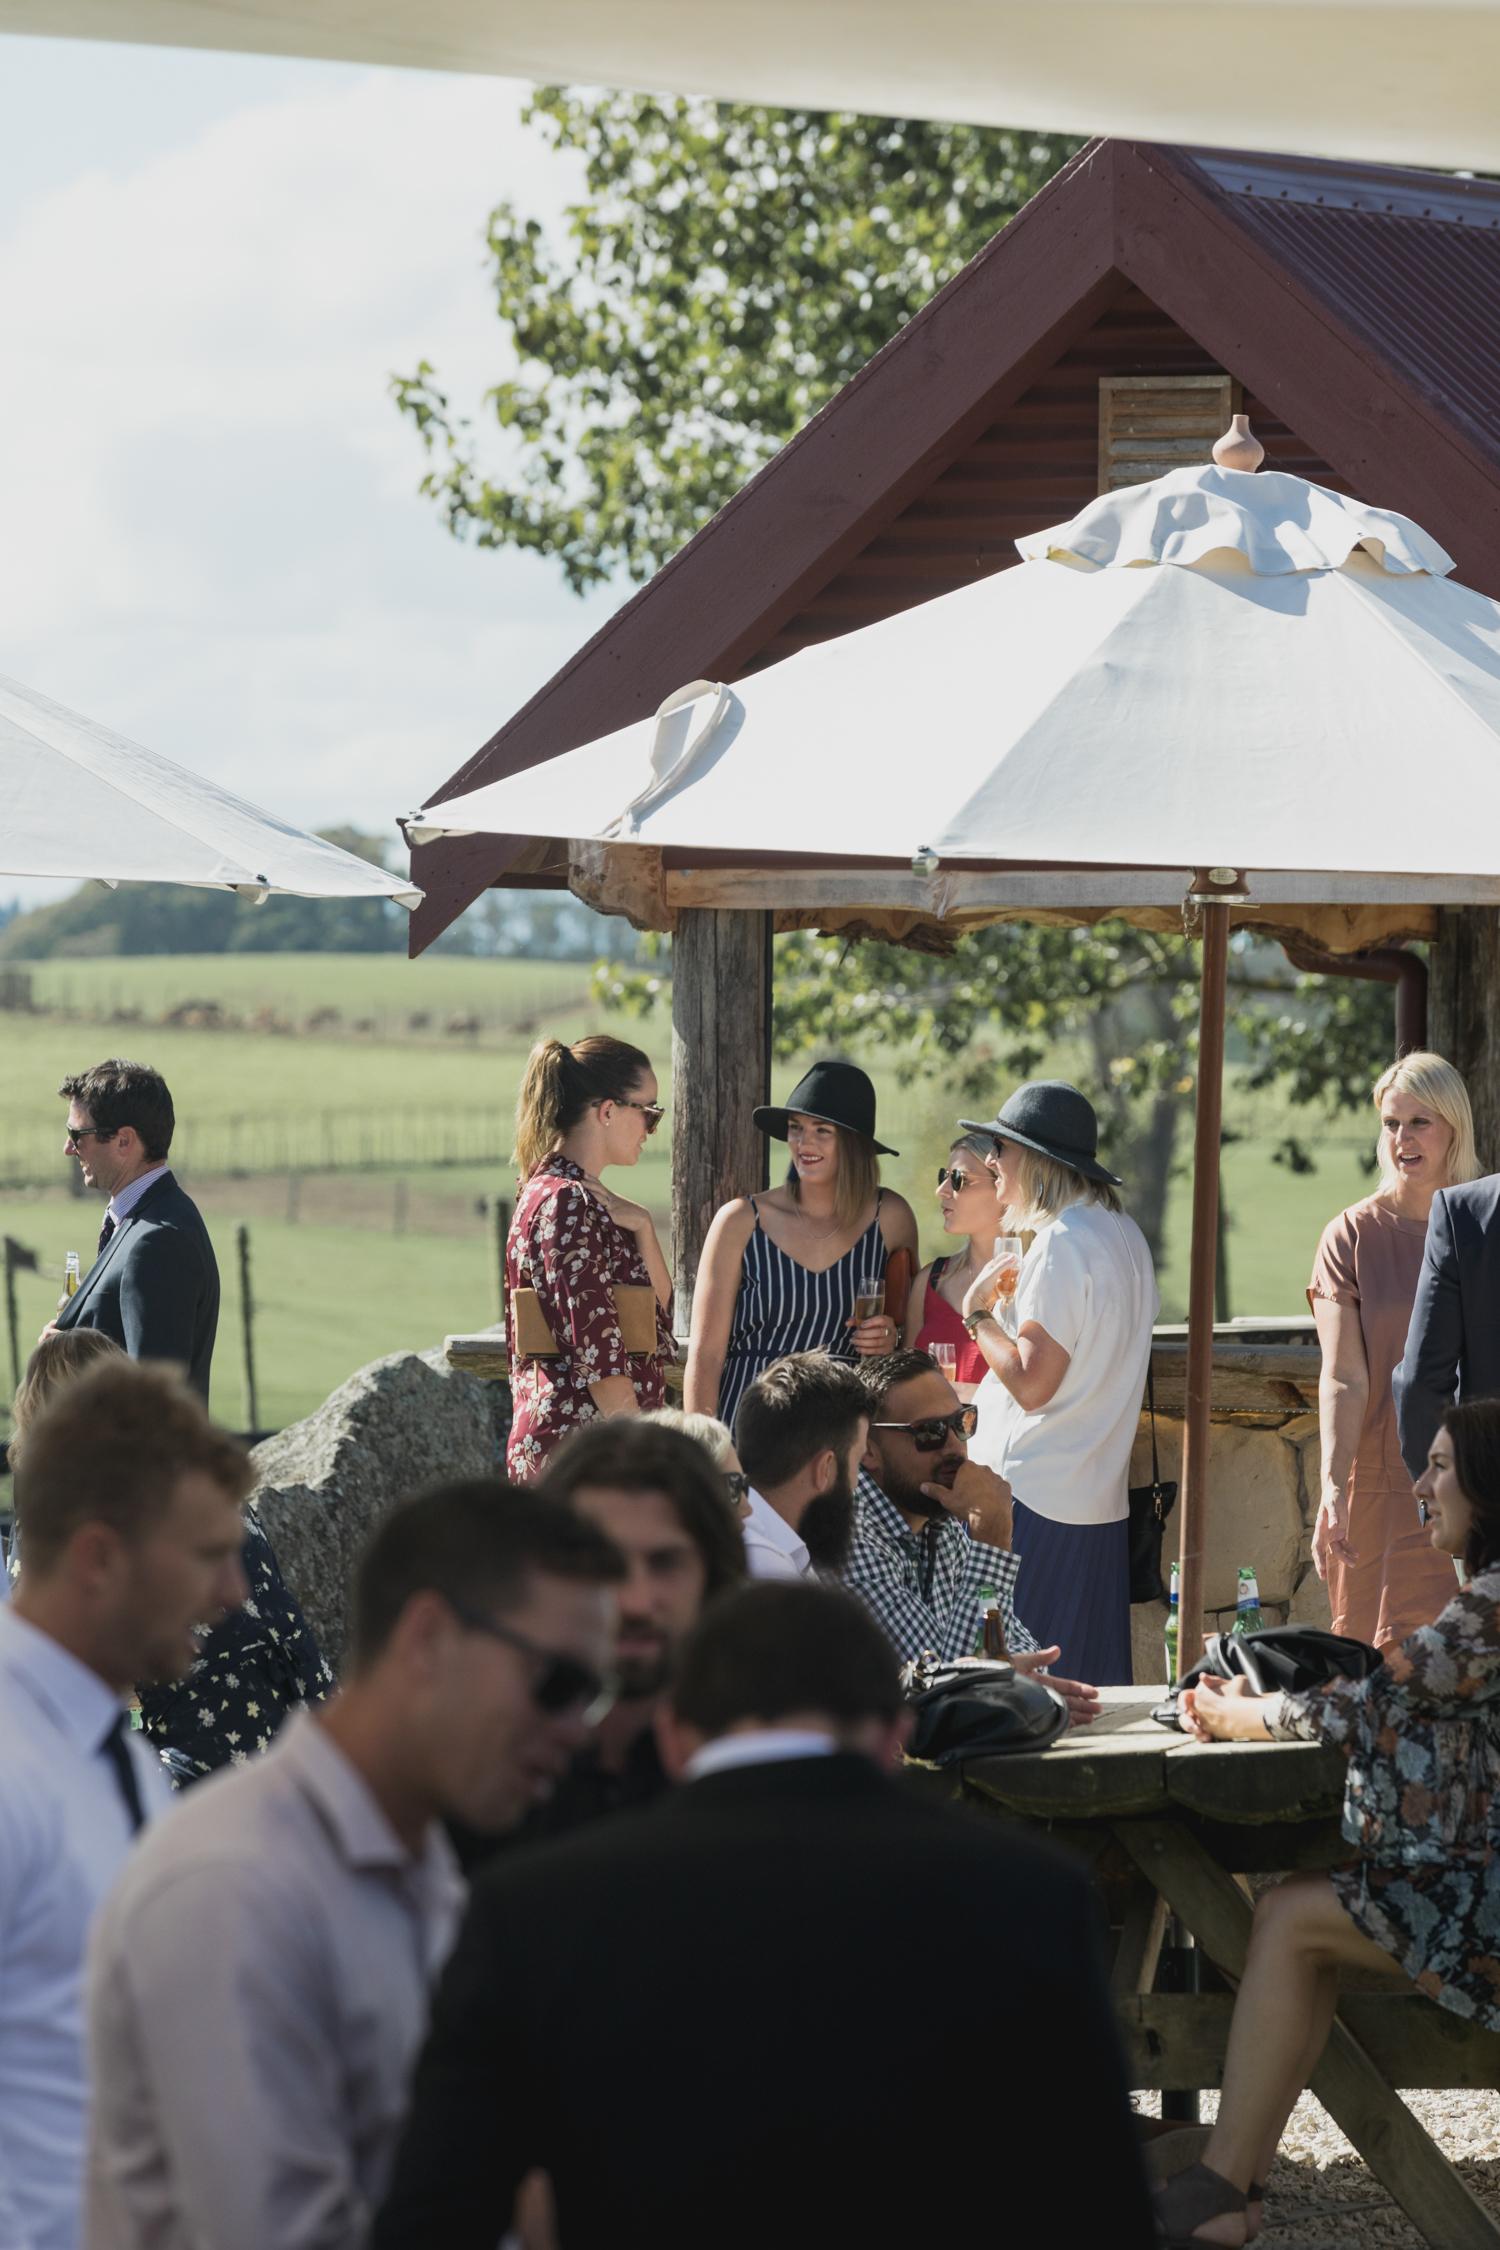 wedding-at-the-red-barn-new-zealand-wedding-photographer-guests-under-umbrellas.jpg